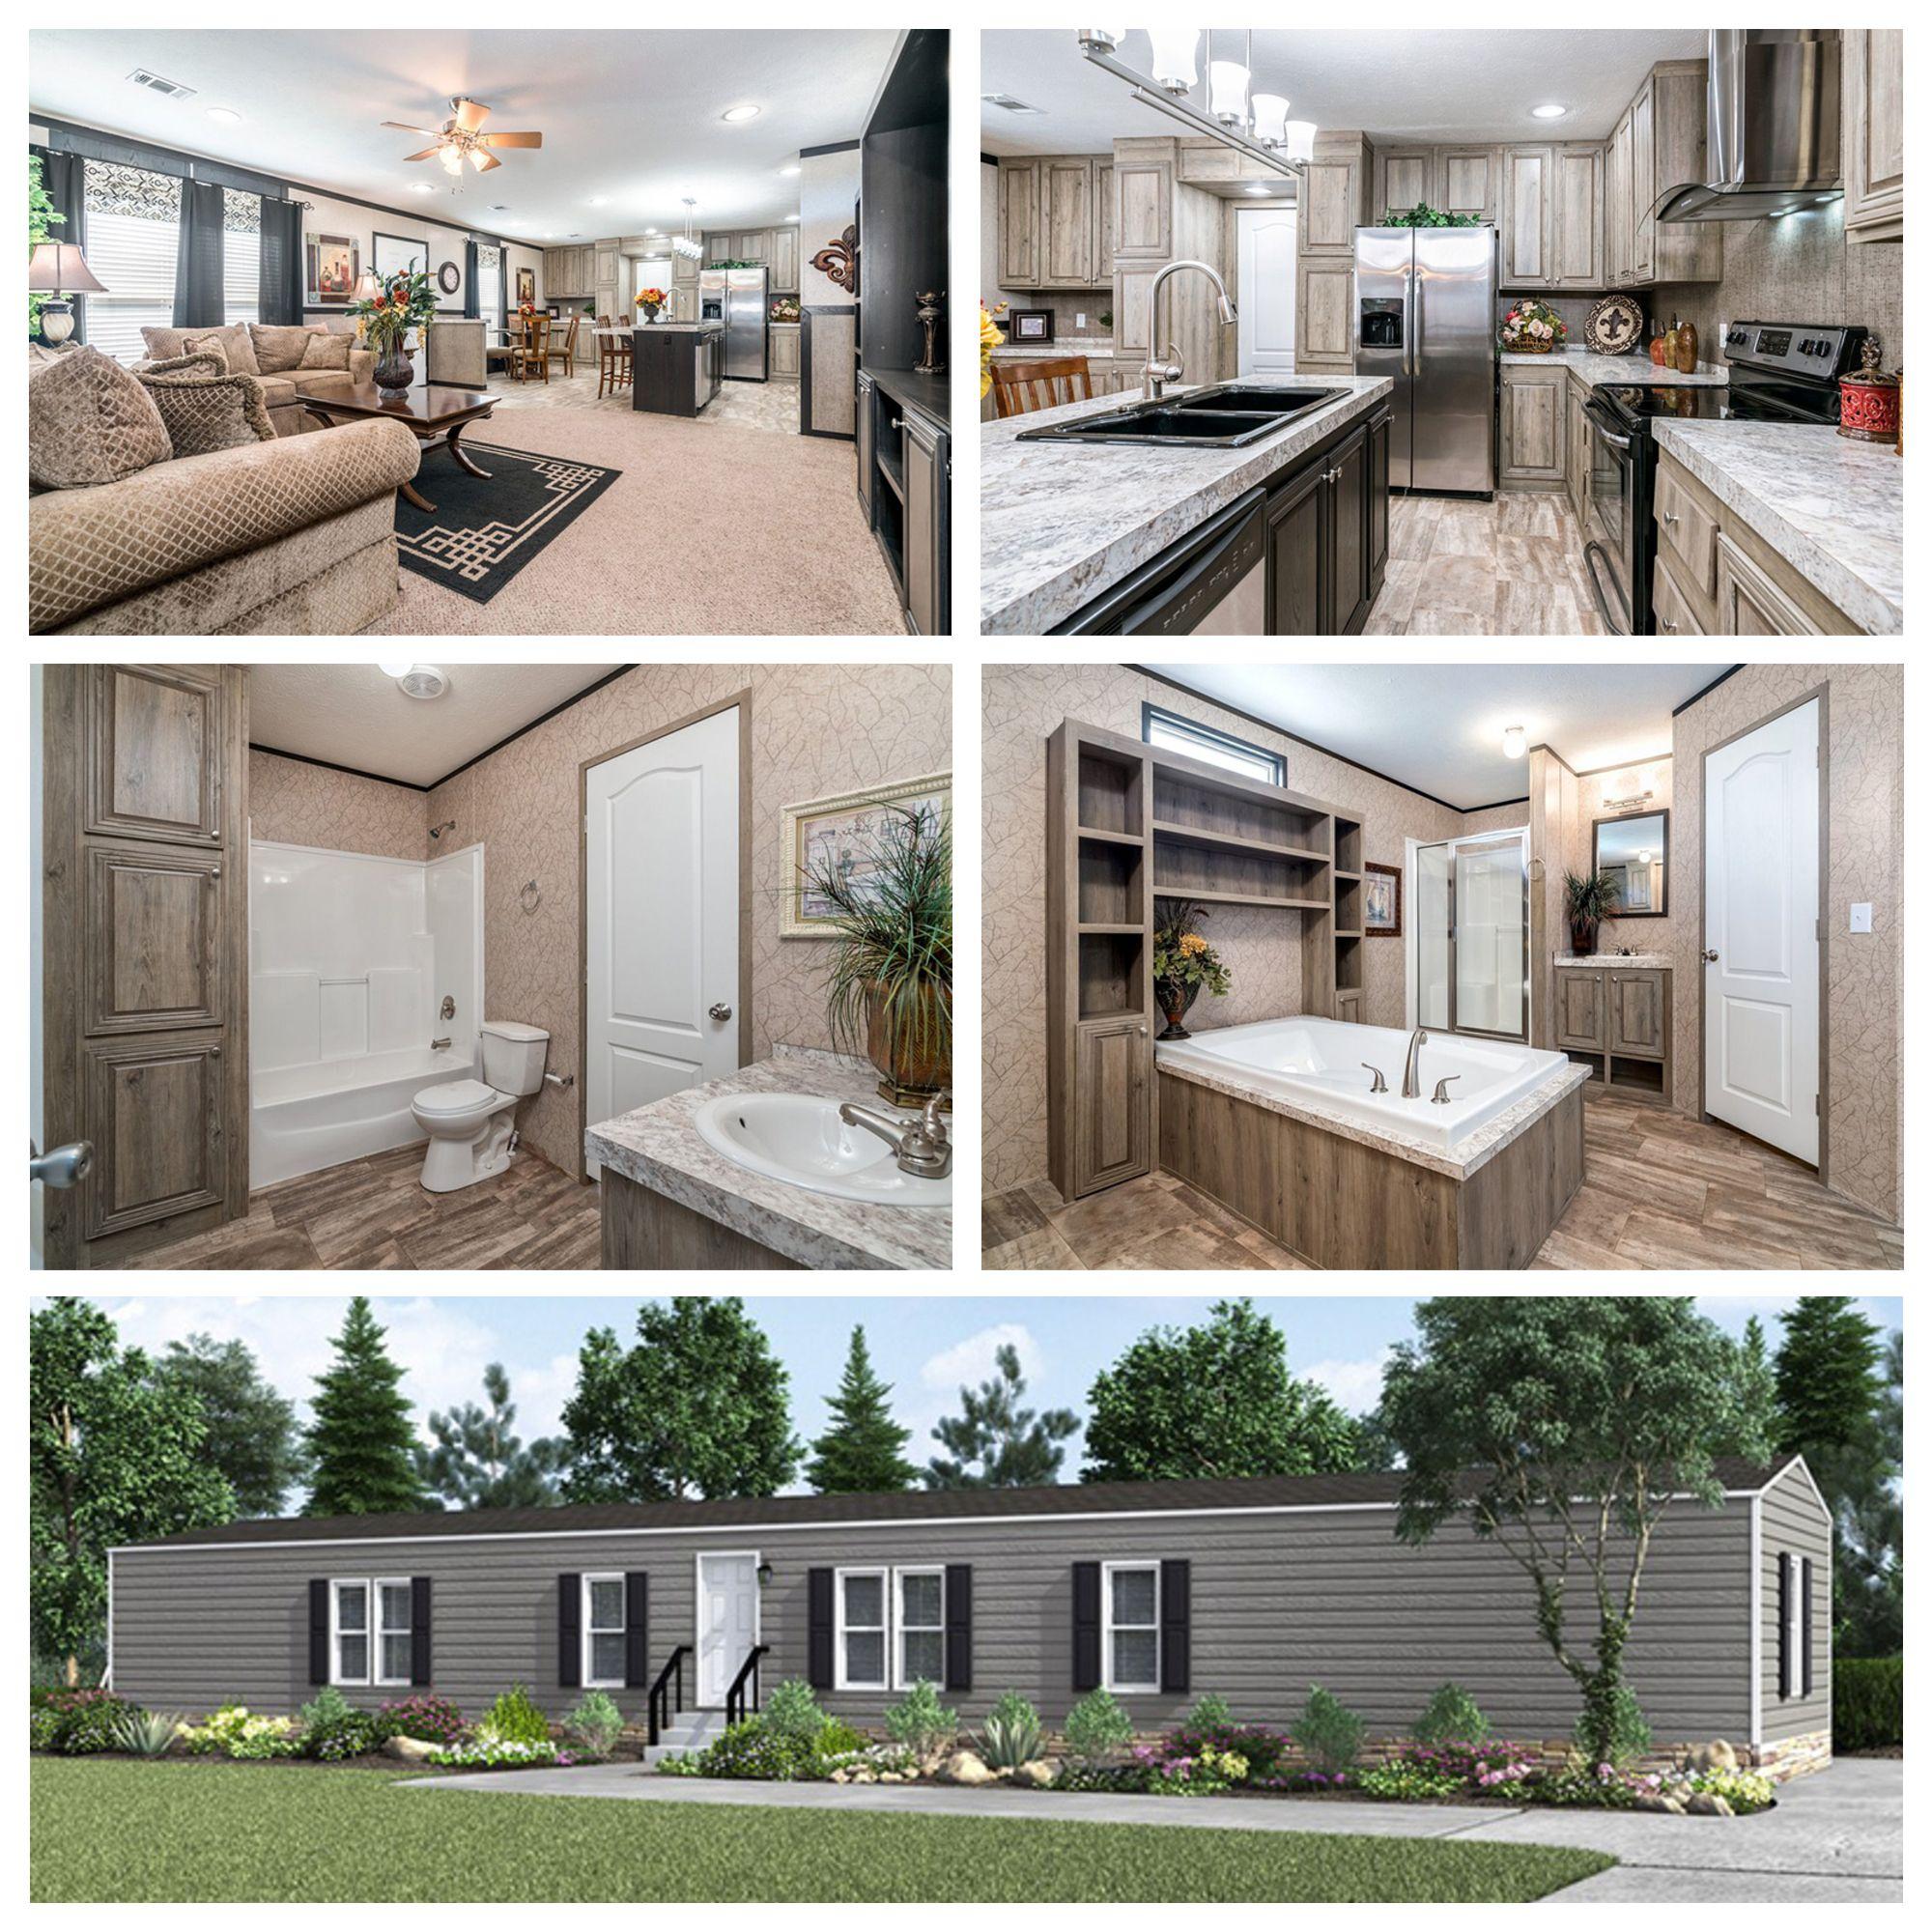 Single Family Mobile Homes on mobile homes lots, mobile homes manufactured homes, mobile homes luxury, mobile homes ranch,